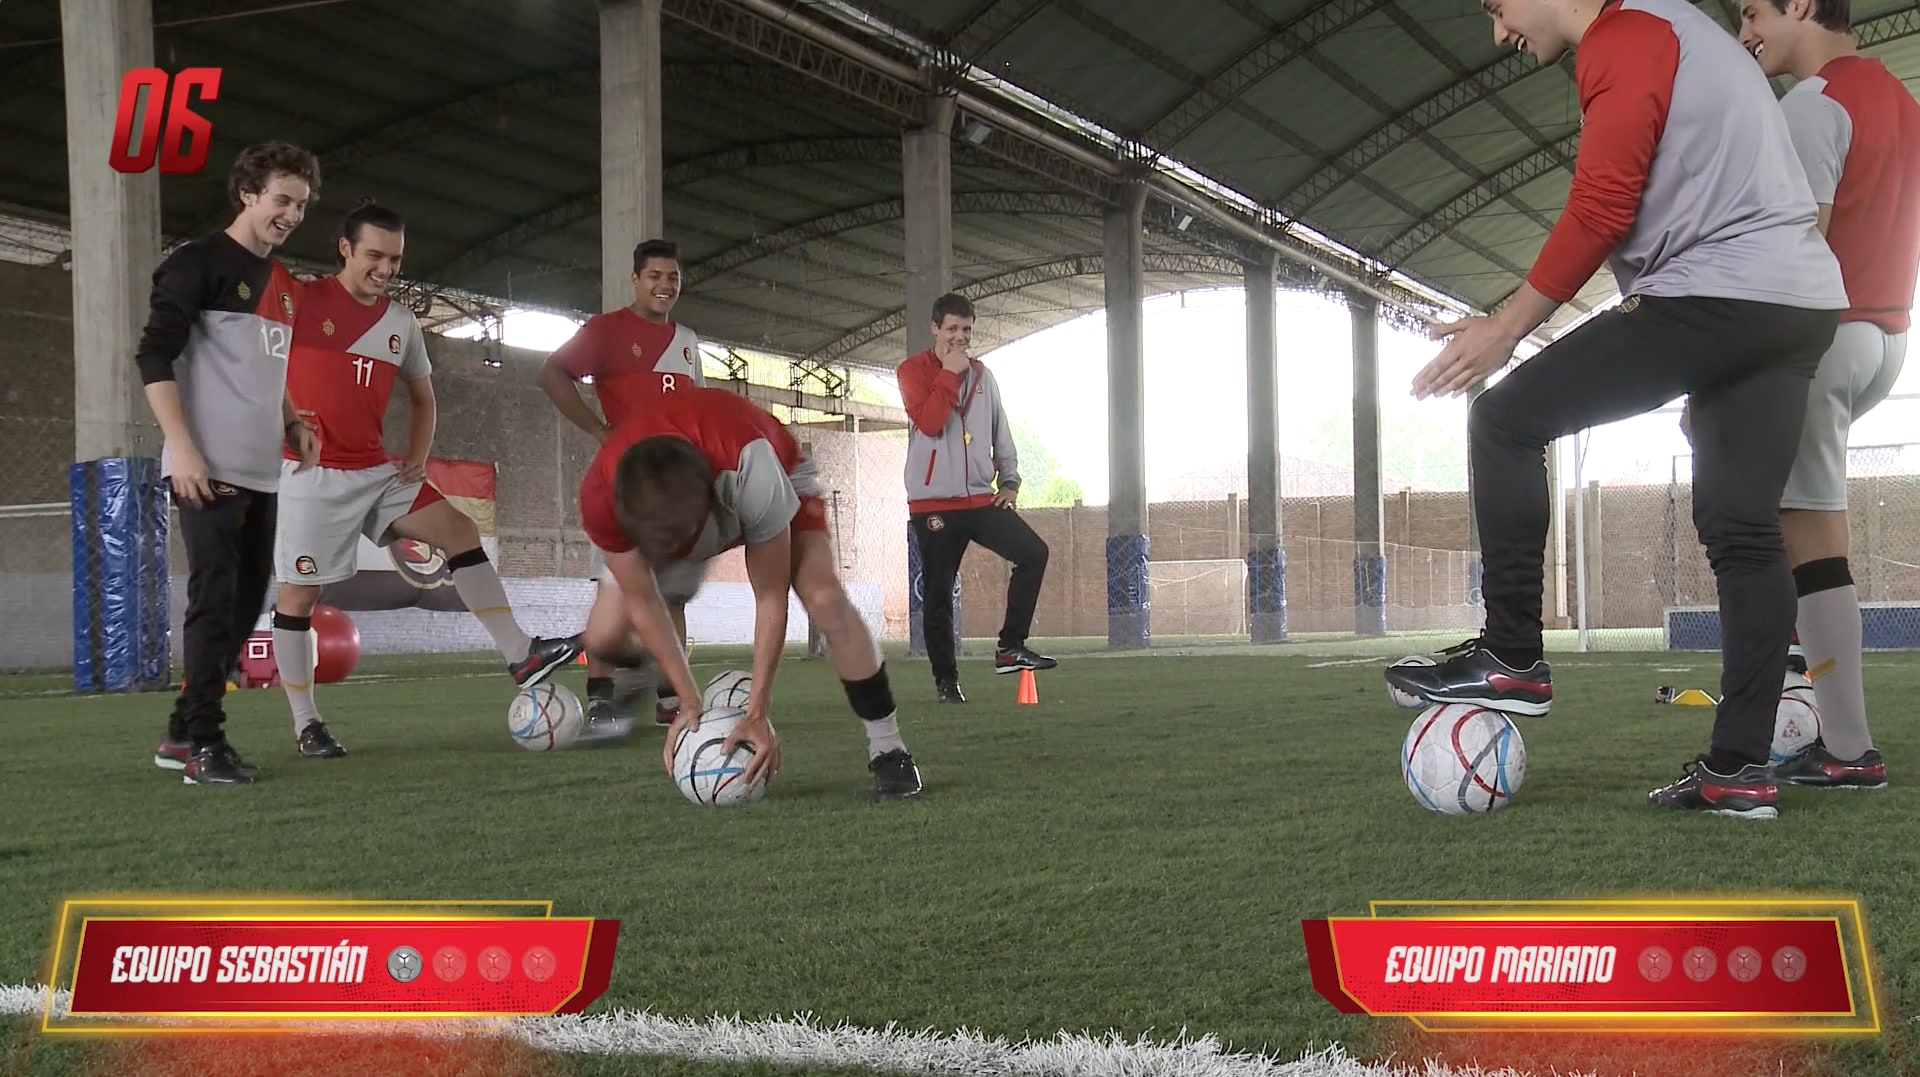 Penales mareados – Equipo Gabo vs. Equipo Lorenzo - O11CE Challenges